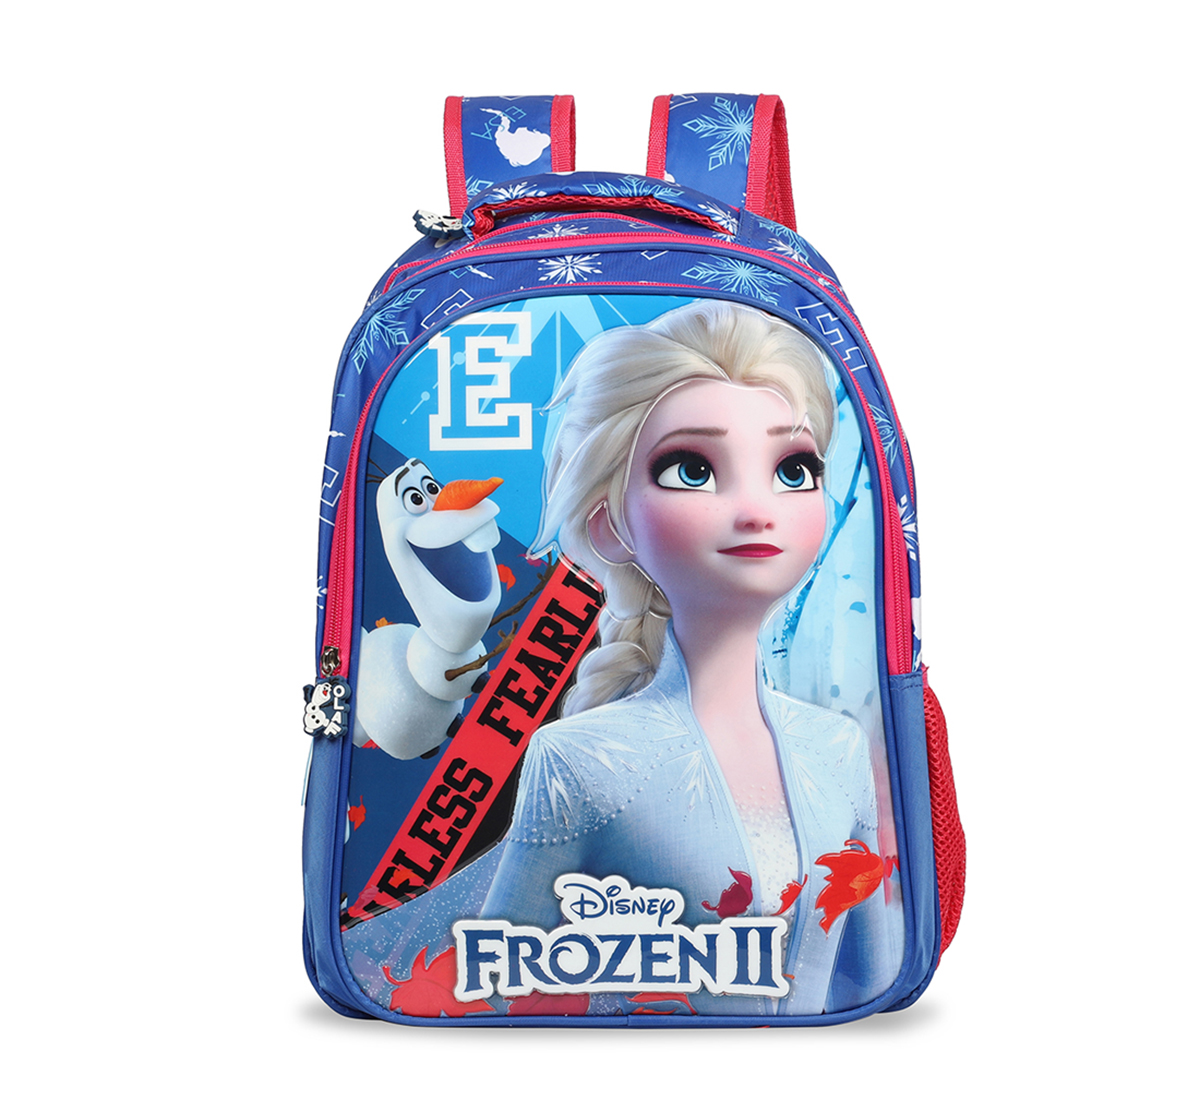 Disney | Disney Frozen2 Elsa Hood School Bag 41 Cm Bags for Girls age 7Y+